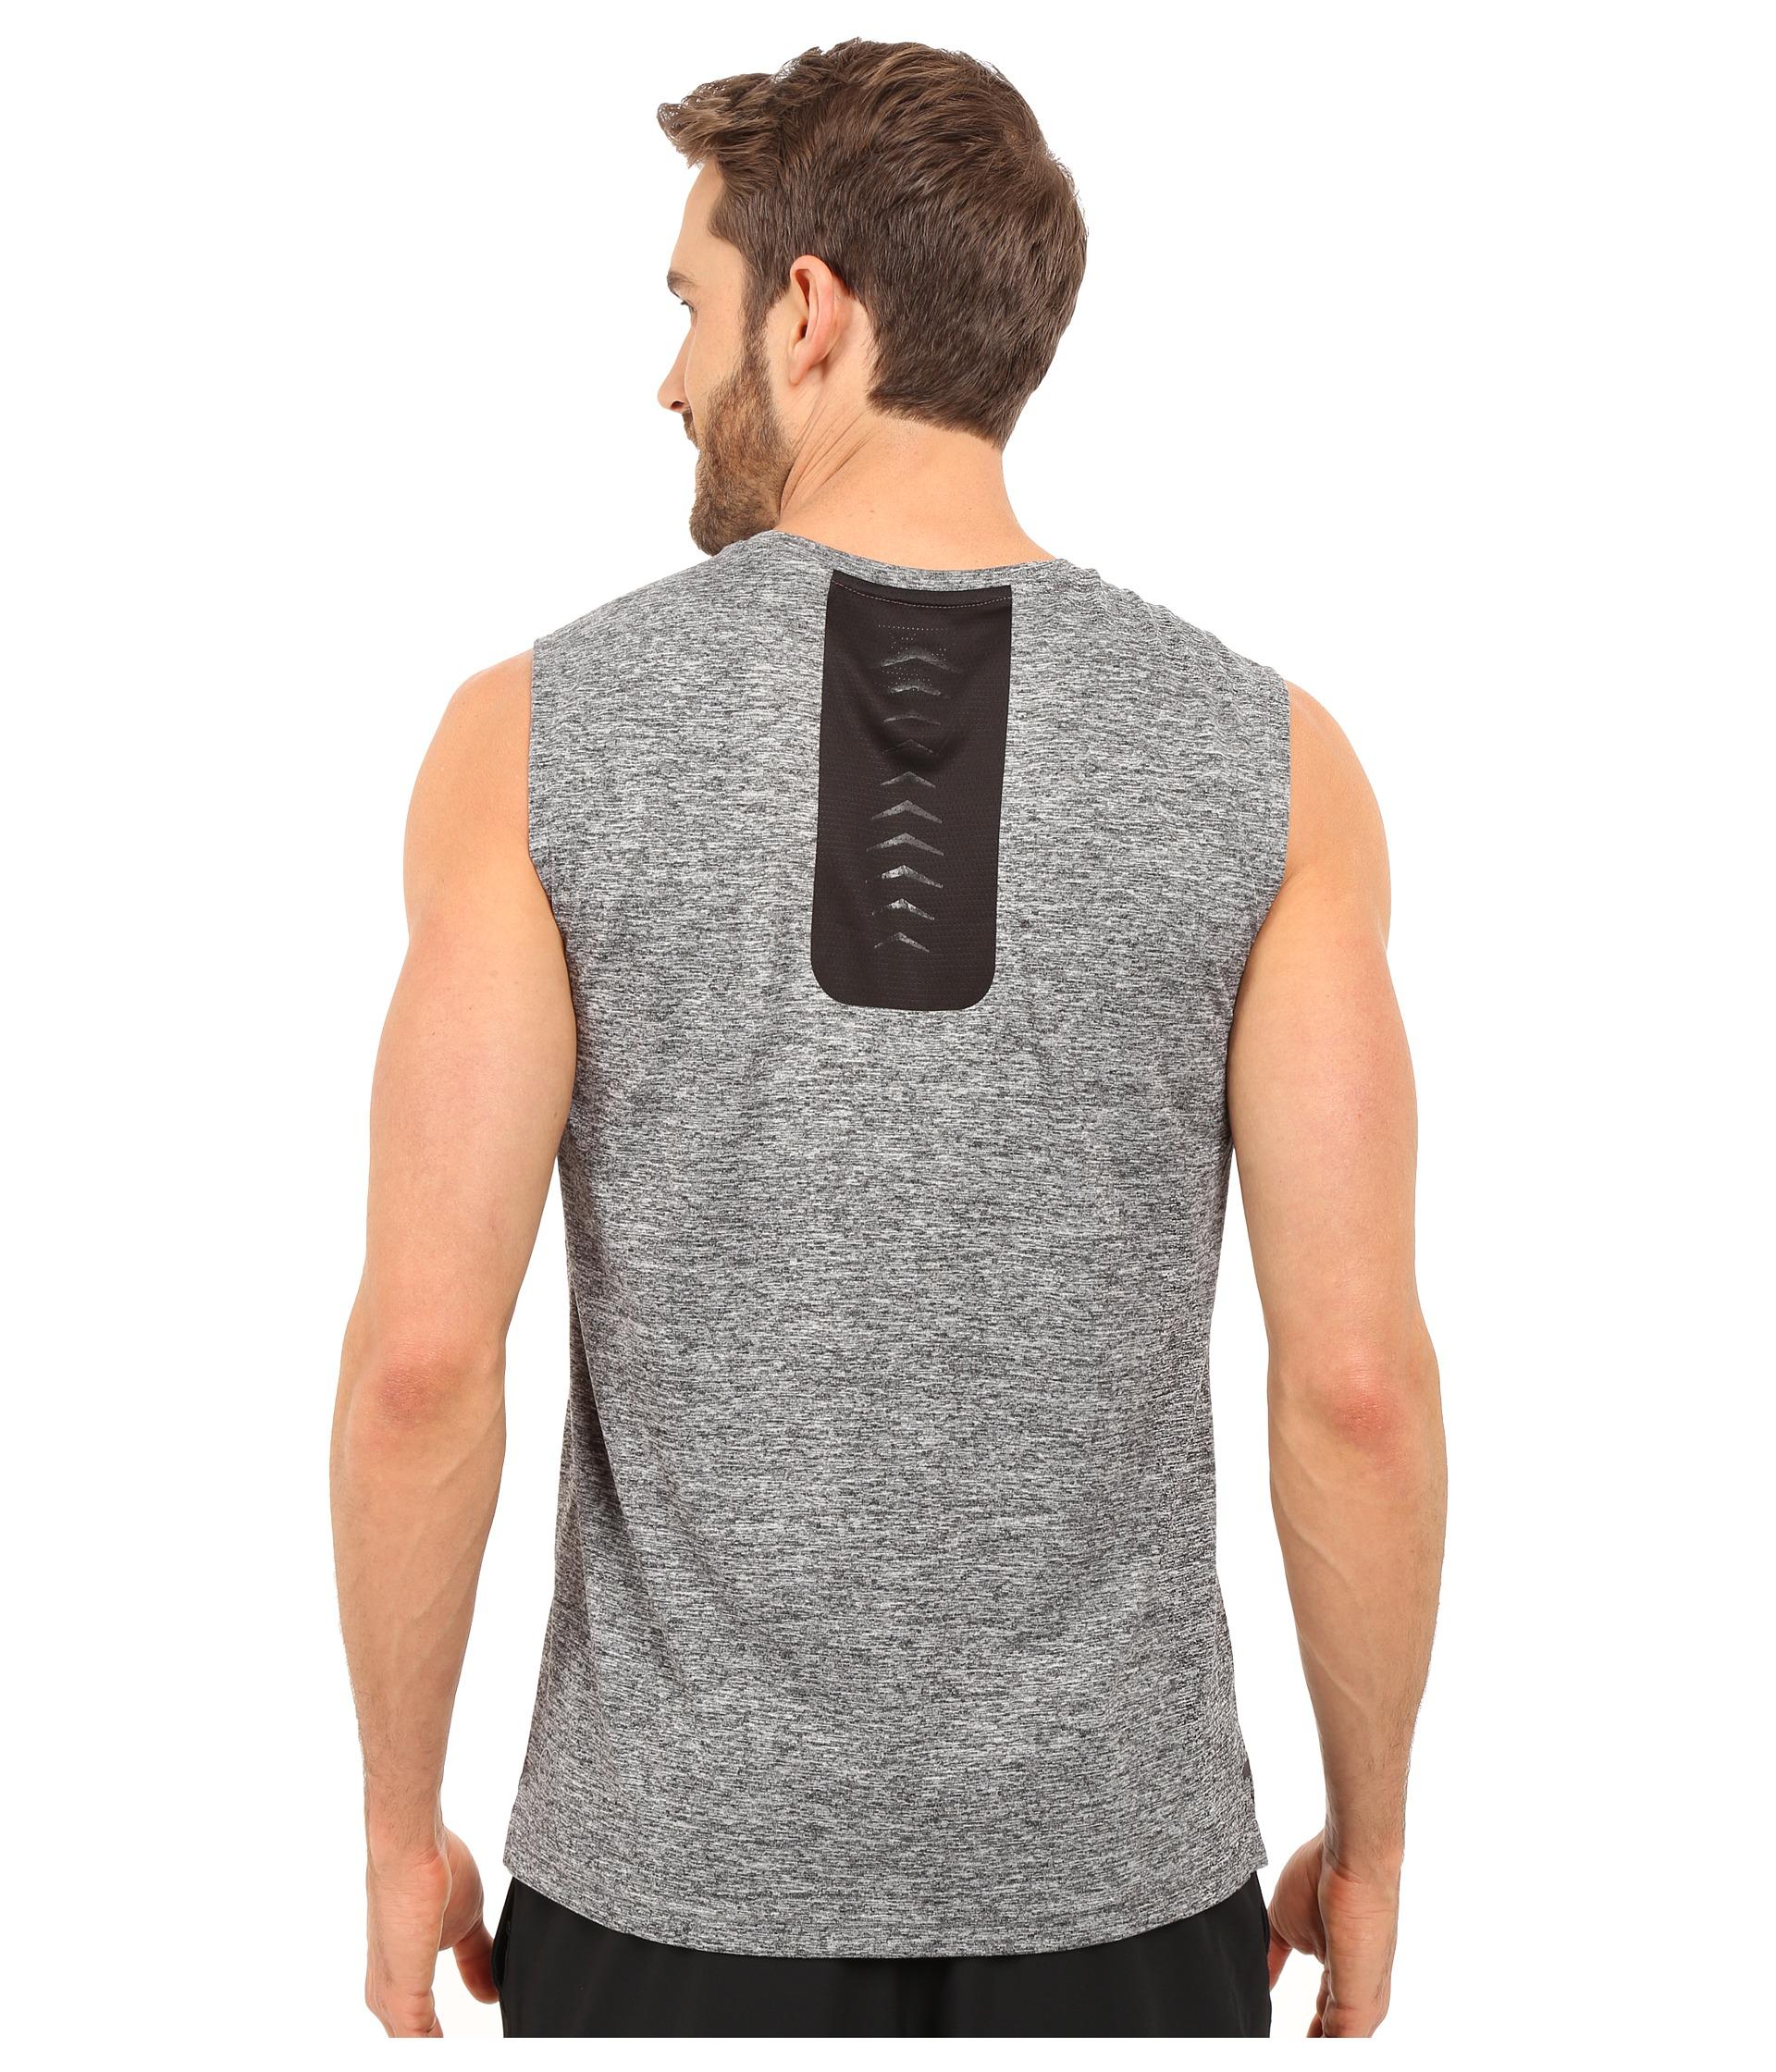 21fe4587254 PUMA Bonded Tech Sleeveless Tee in Gray for Men - Lyst